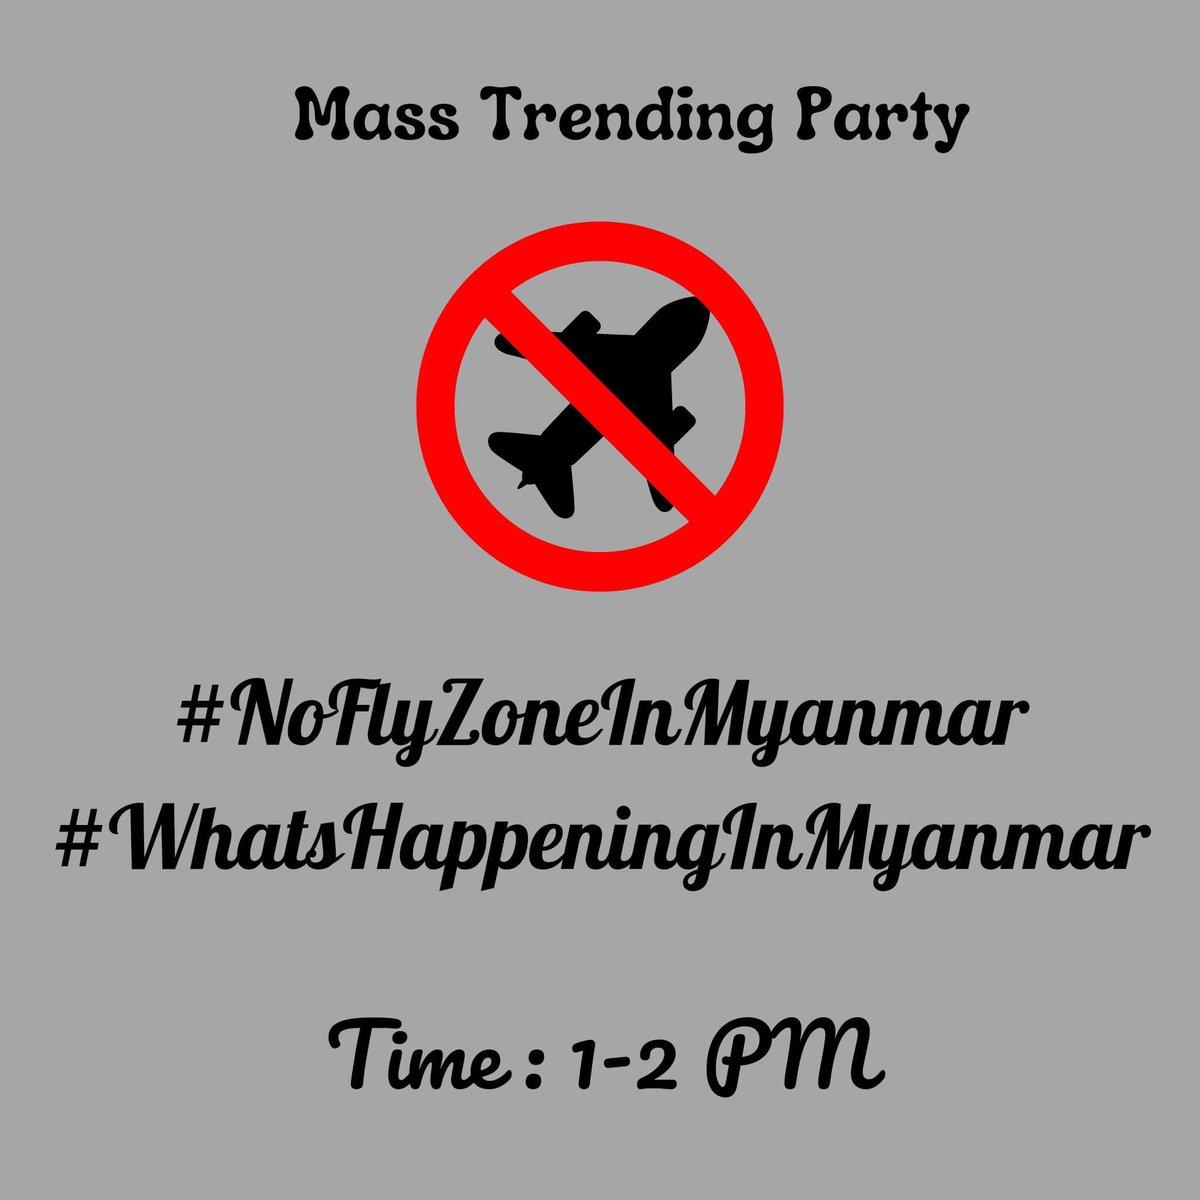 #NoFlyZoneInMyanmar #WhatsHappeningInMyanmar #FreeAungSanSuuKyiAndDetainees Free @SeanTurnell @freya_cole @SchranerBurgen1 @RapporteurUn @USEmbassyBurma @ukinmyanmar https://t.co/MuzI8SqTXB